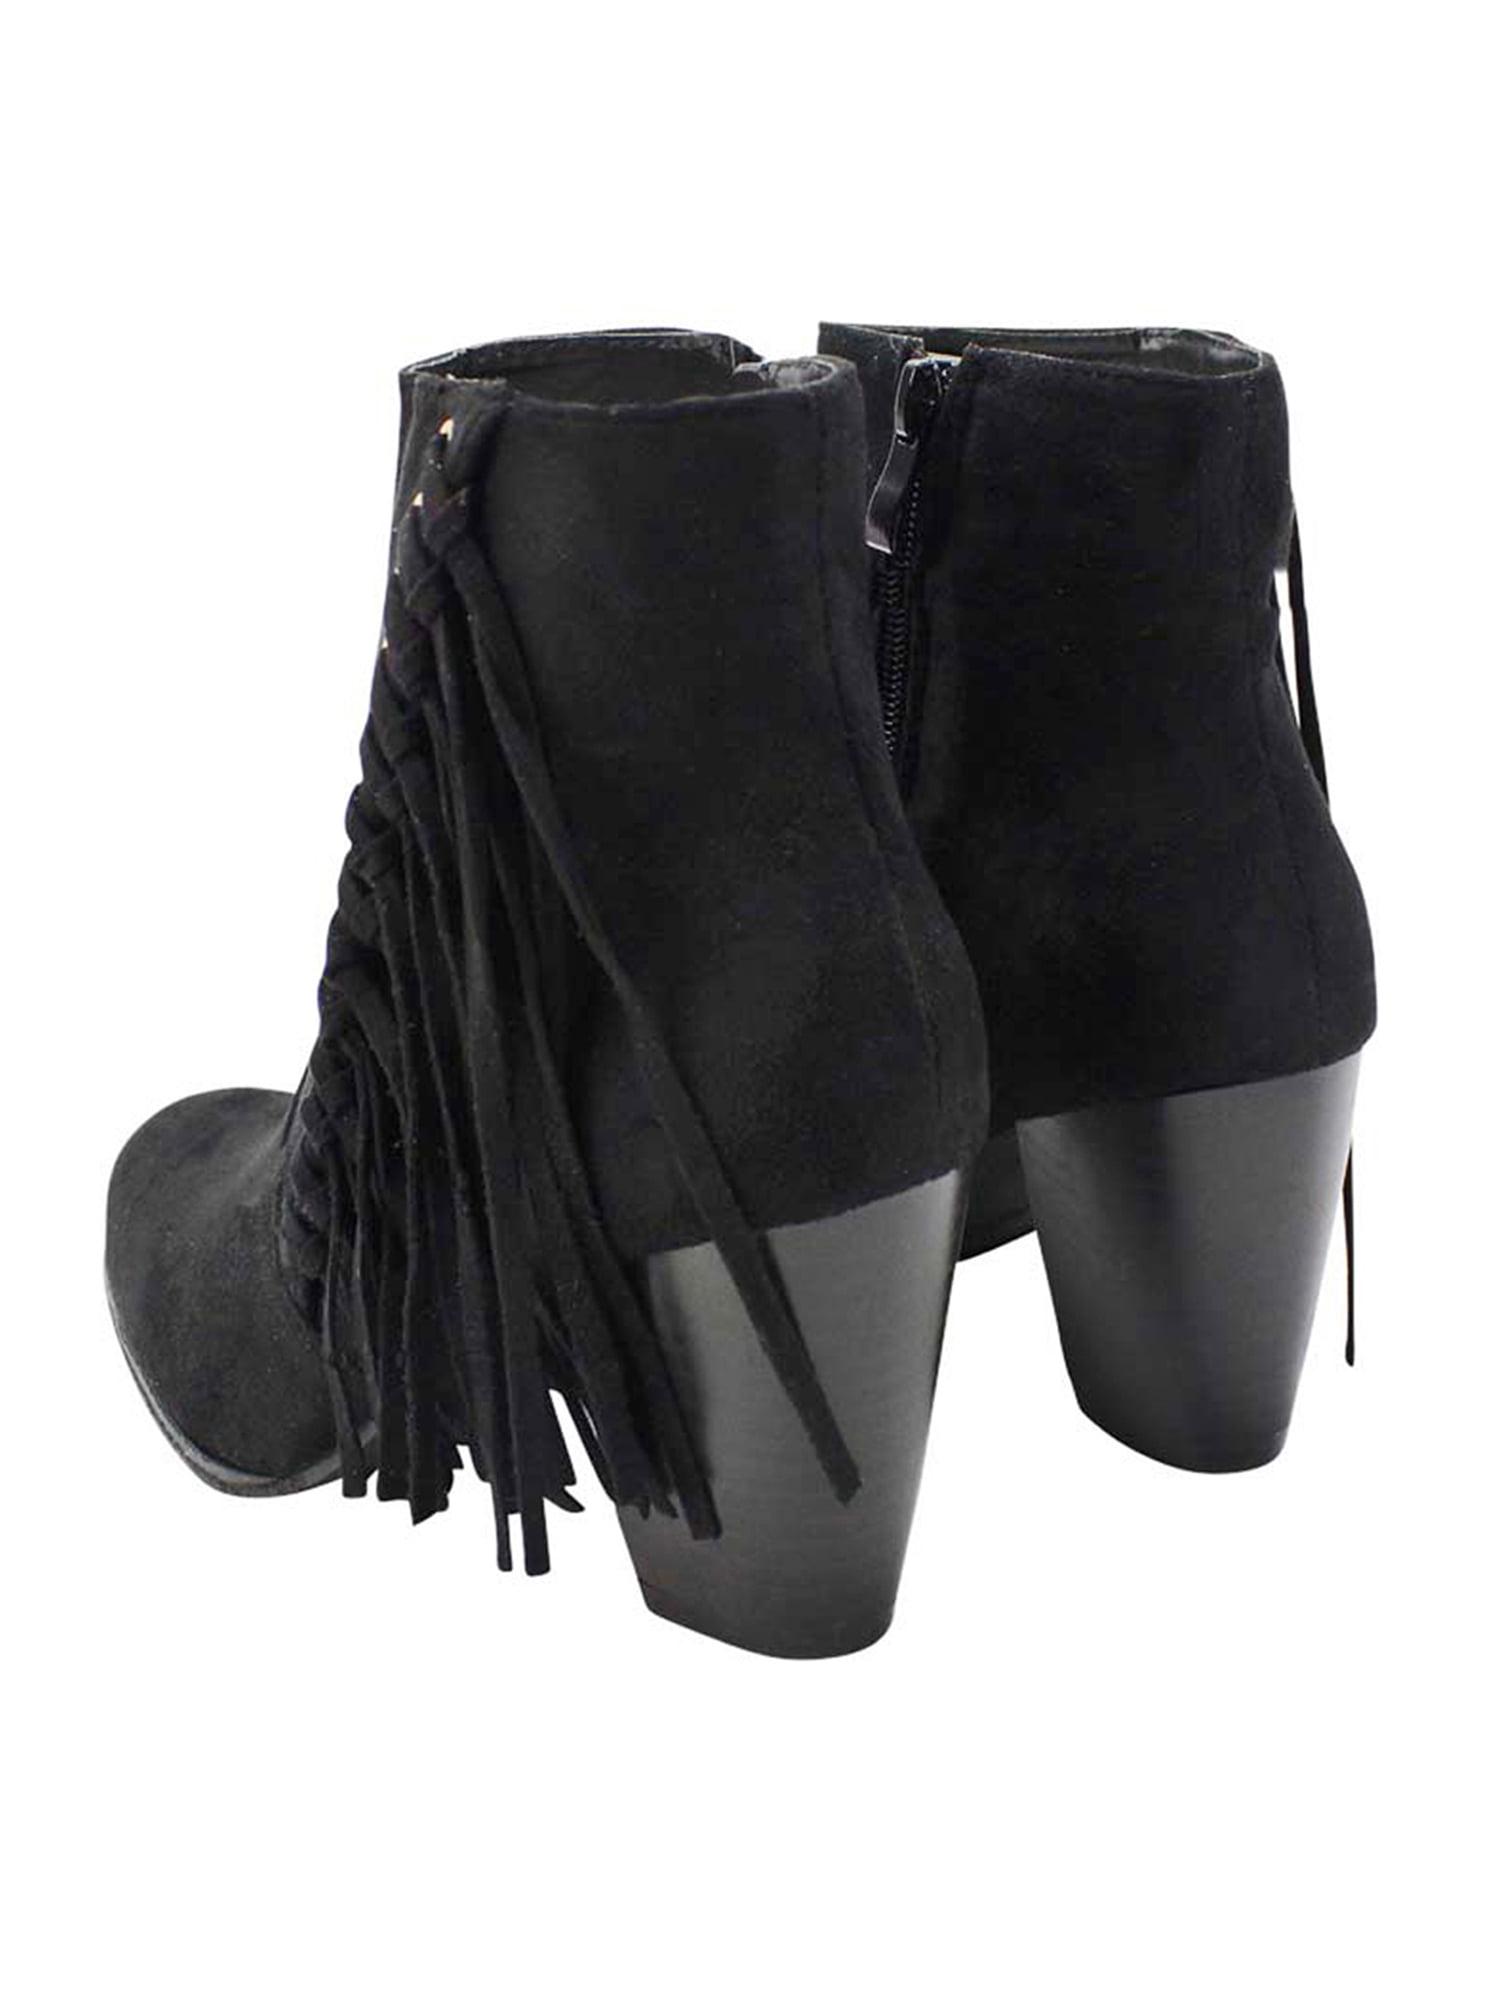 Boho Fringe Womens Stacked Heel Booties